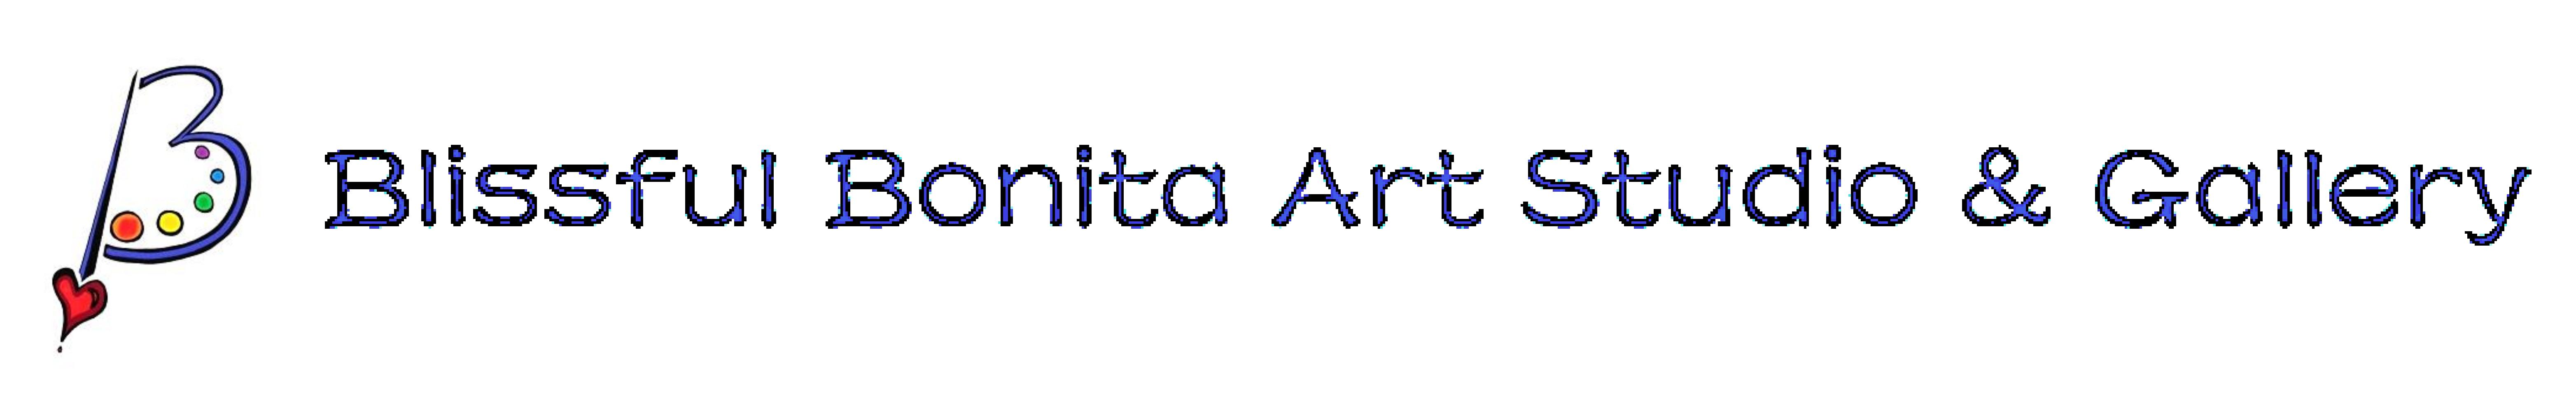 Blissful Bonita Art